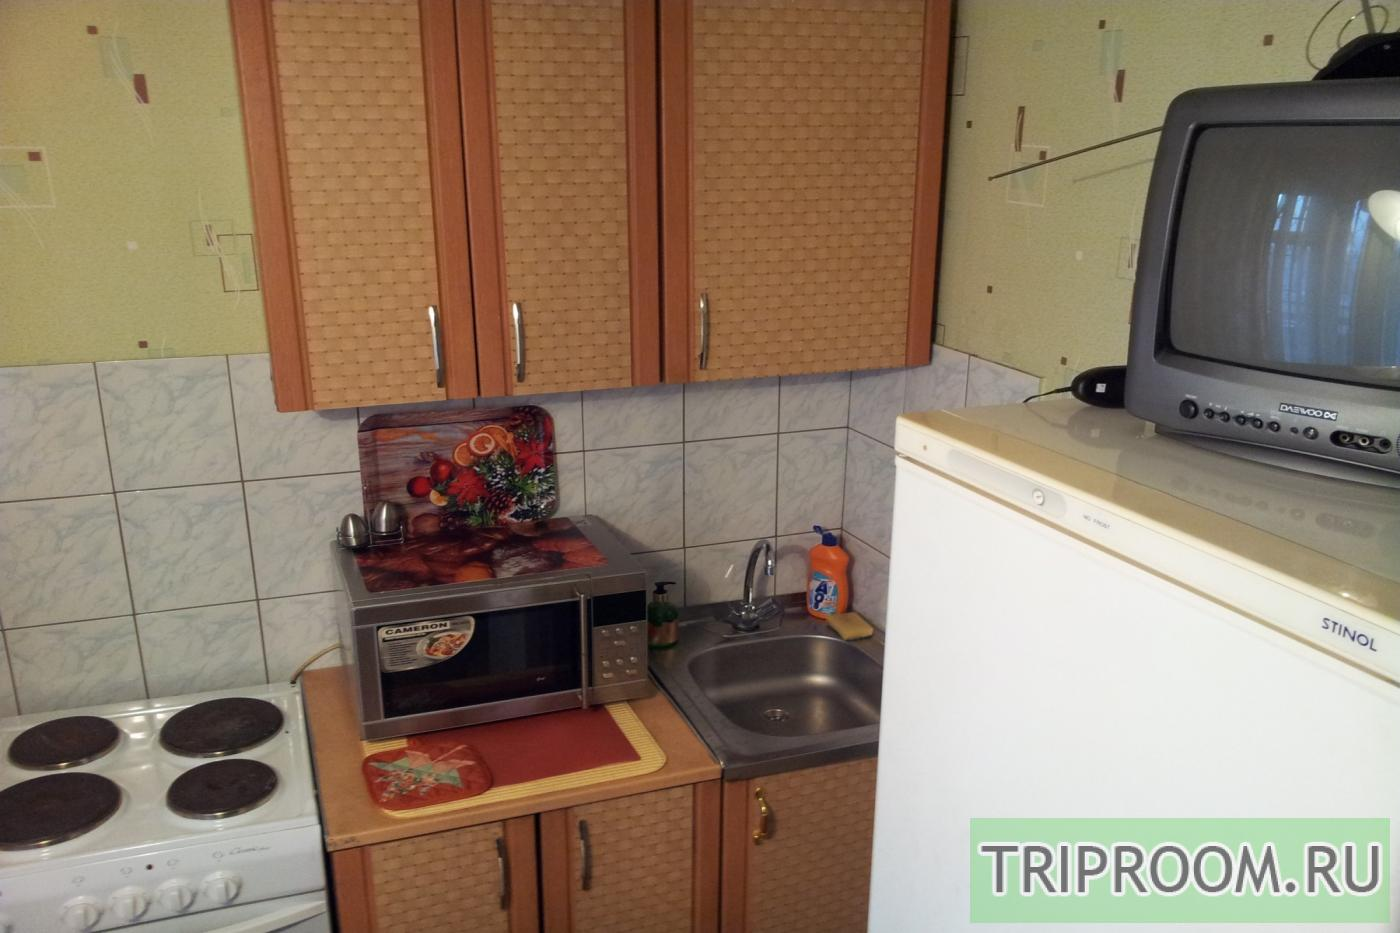 1-комнатная квартира посуточно (вариант № 30851), ул. Циолковского улица, фото № 11